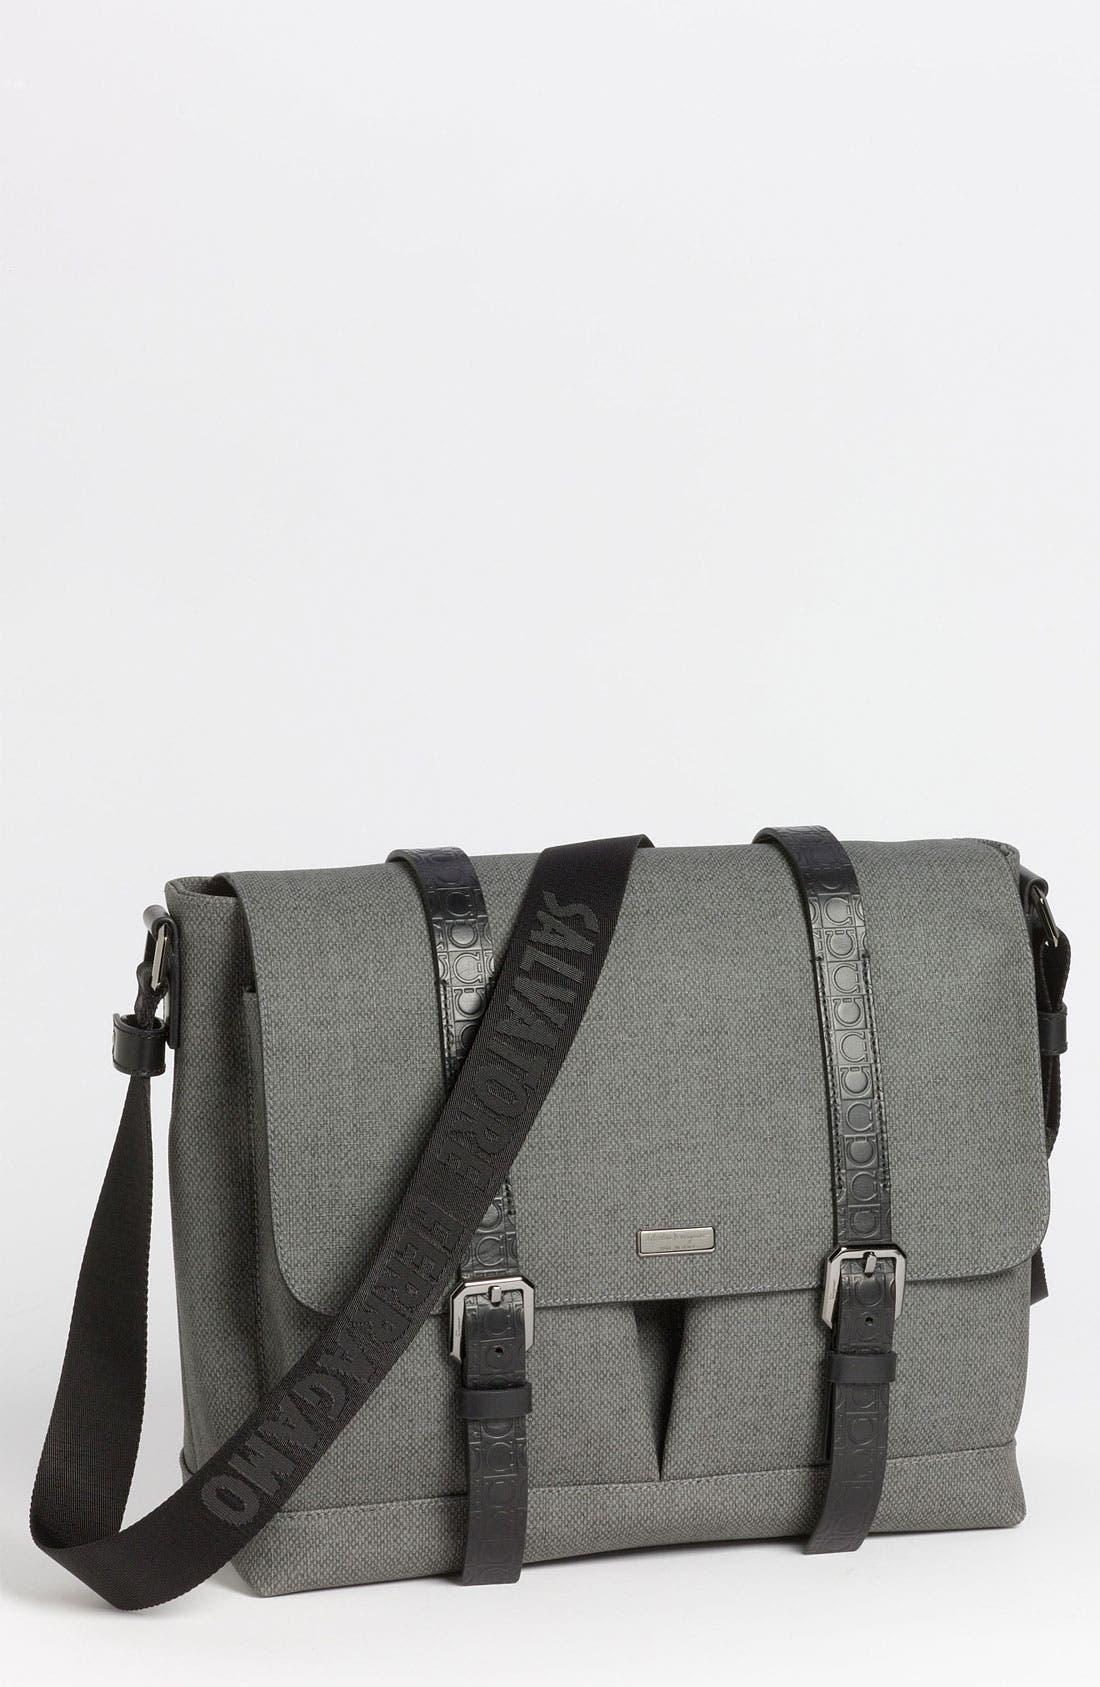 Main Image - Salvatore Ferragamo 'New Form' Messenger Bag